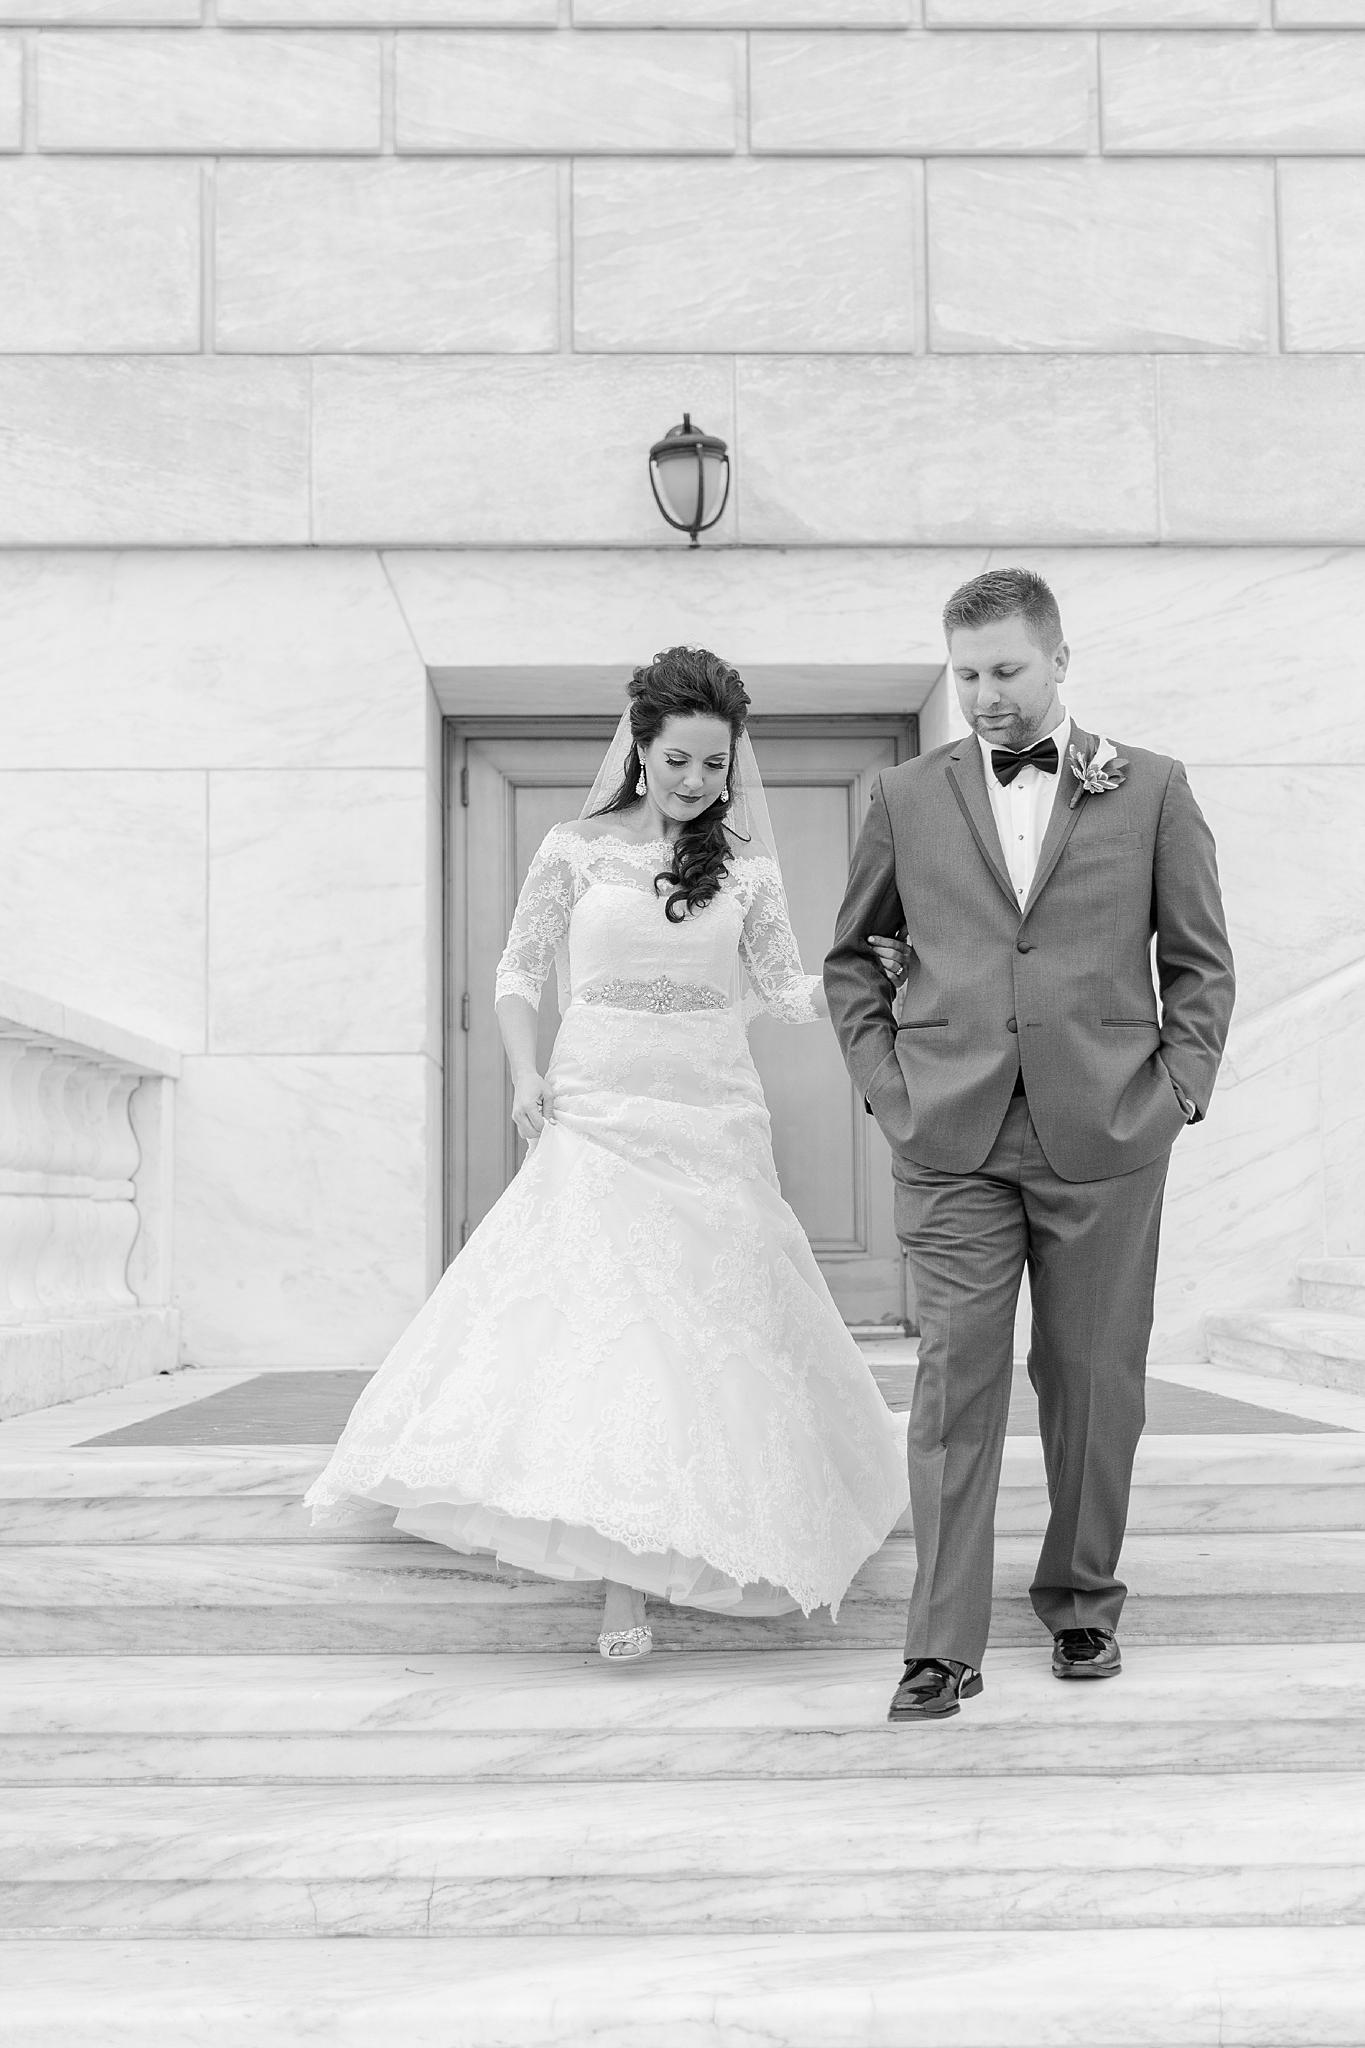 detroit-colony-club-wedding-regal-romantic-photography-in-detroit-mi-by-courtney-carolyn-photography_0019.jpg